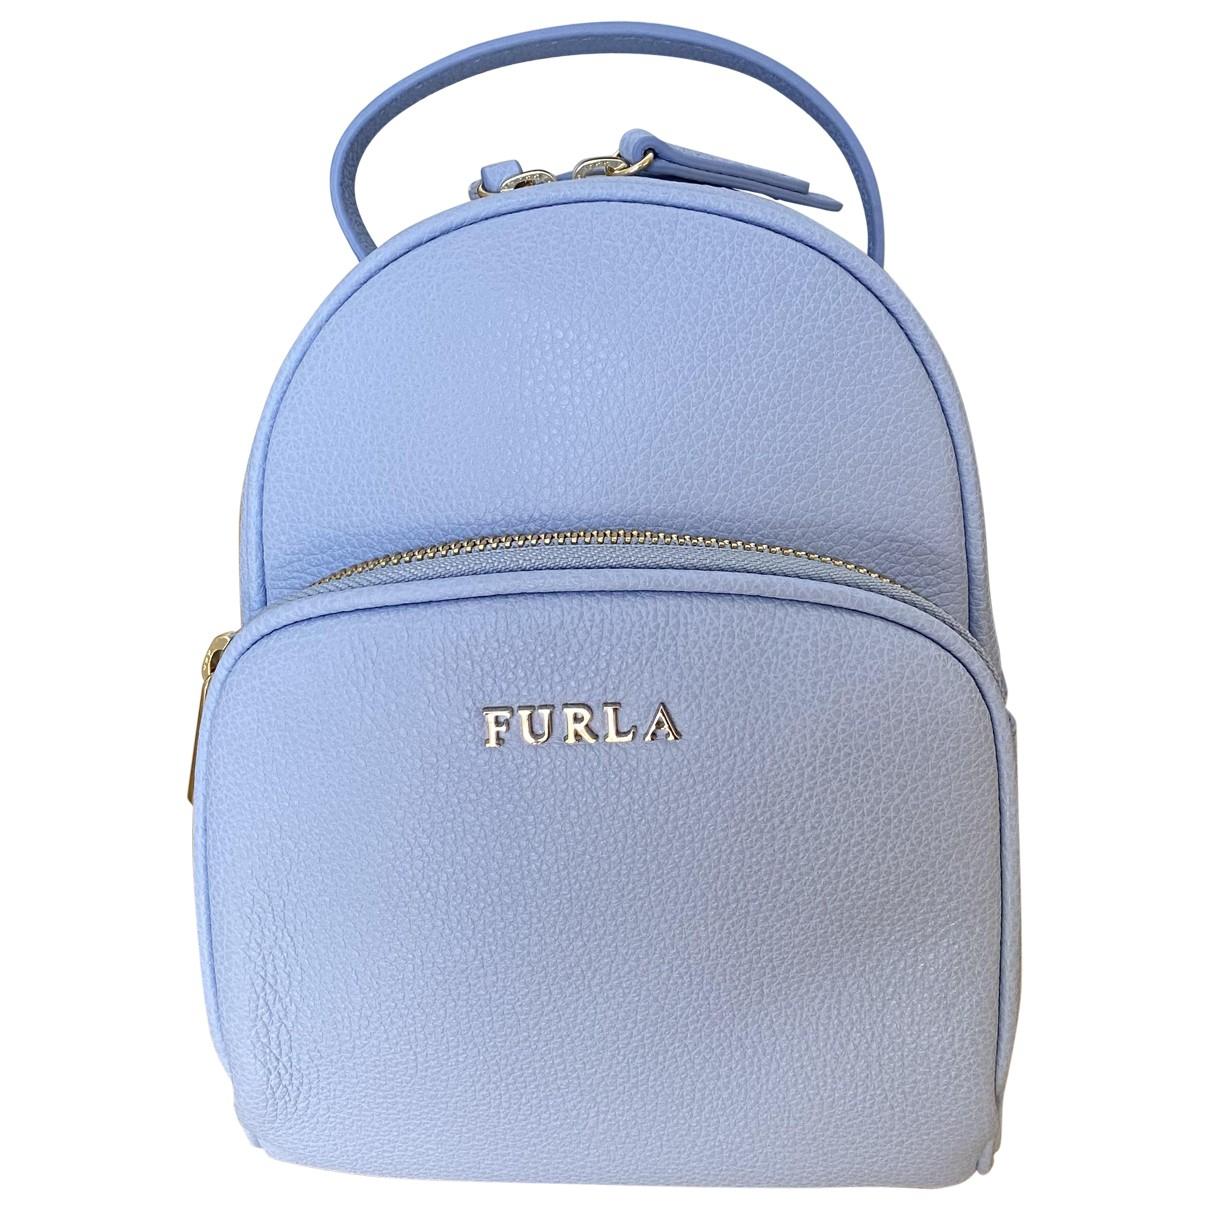 Furla \N Blue Leather backpack for Women \N